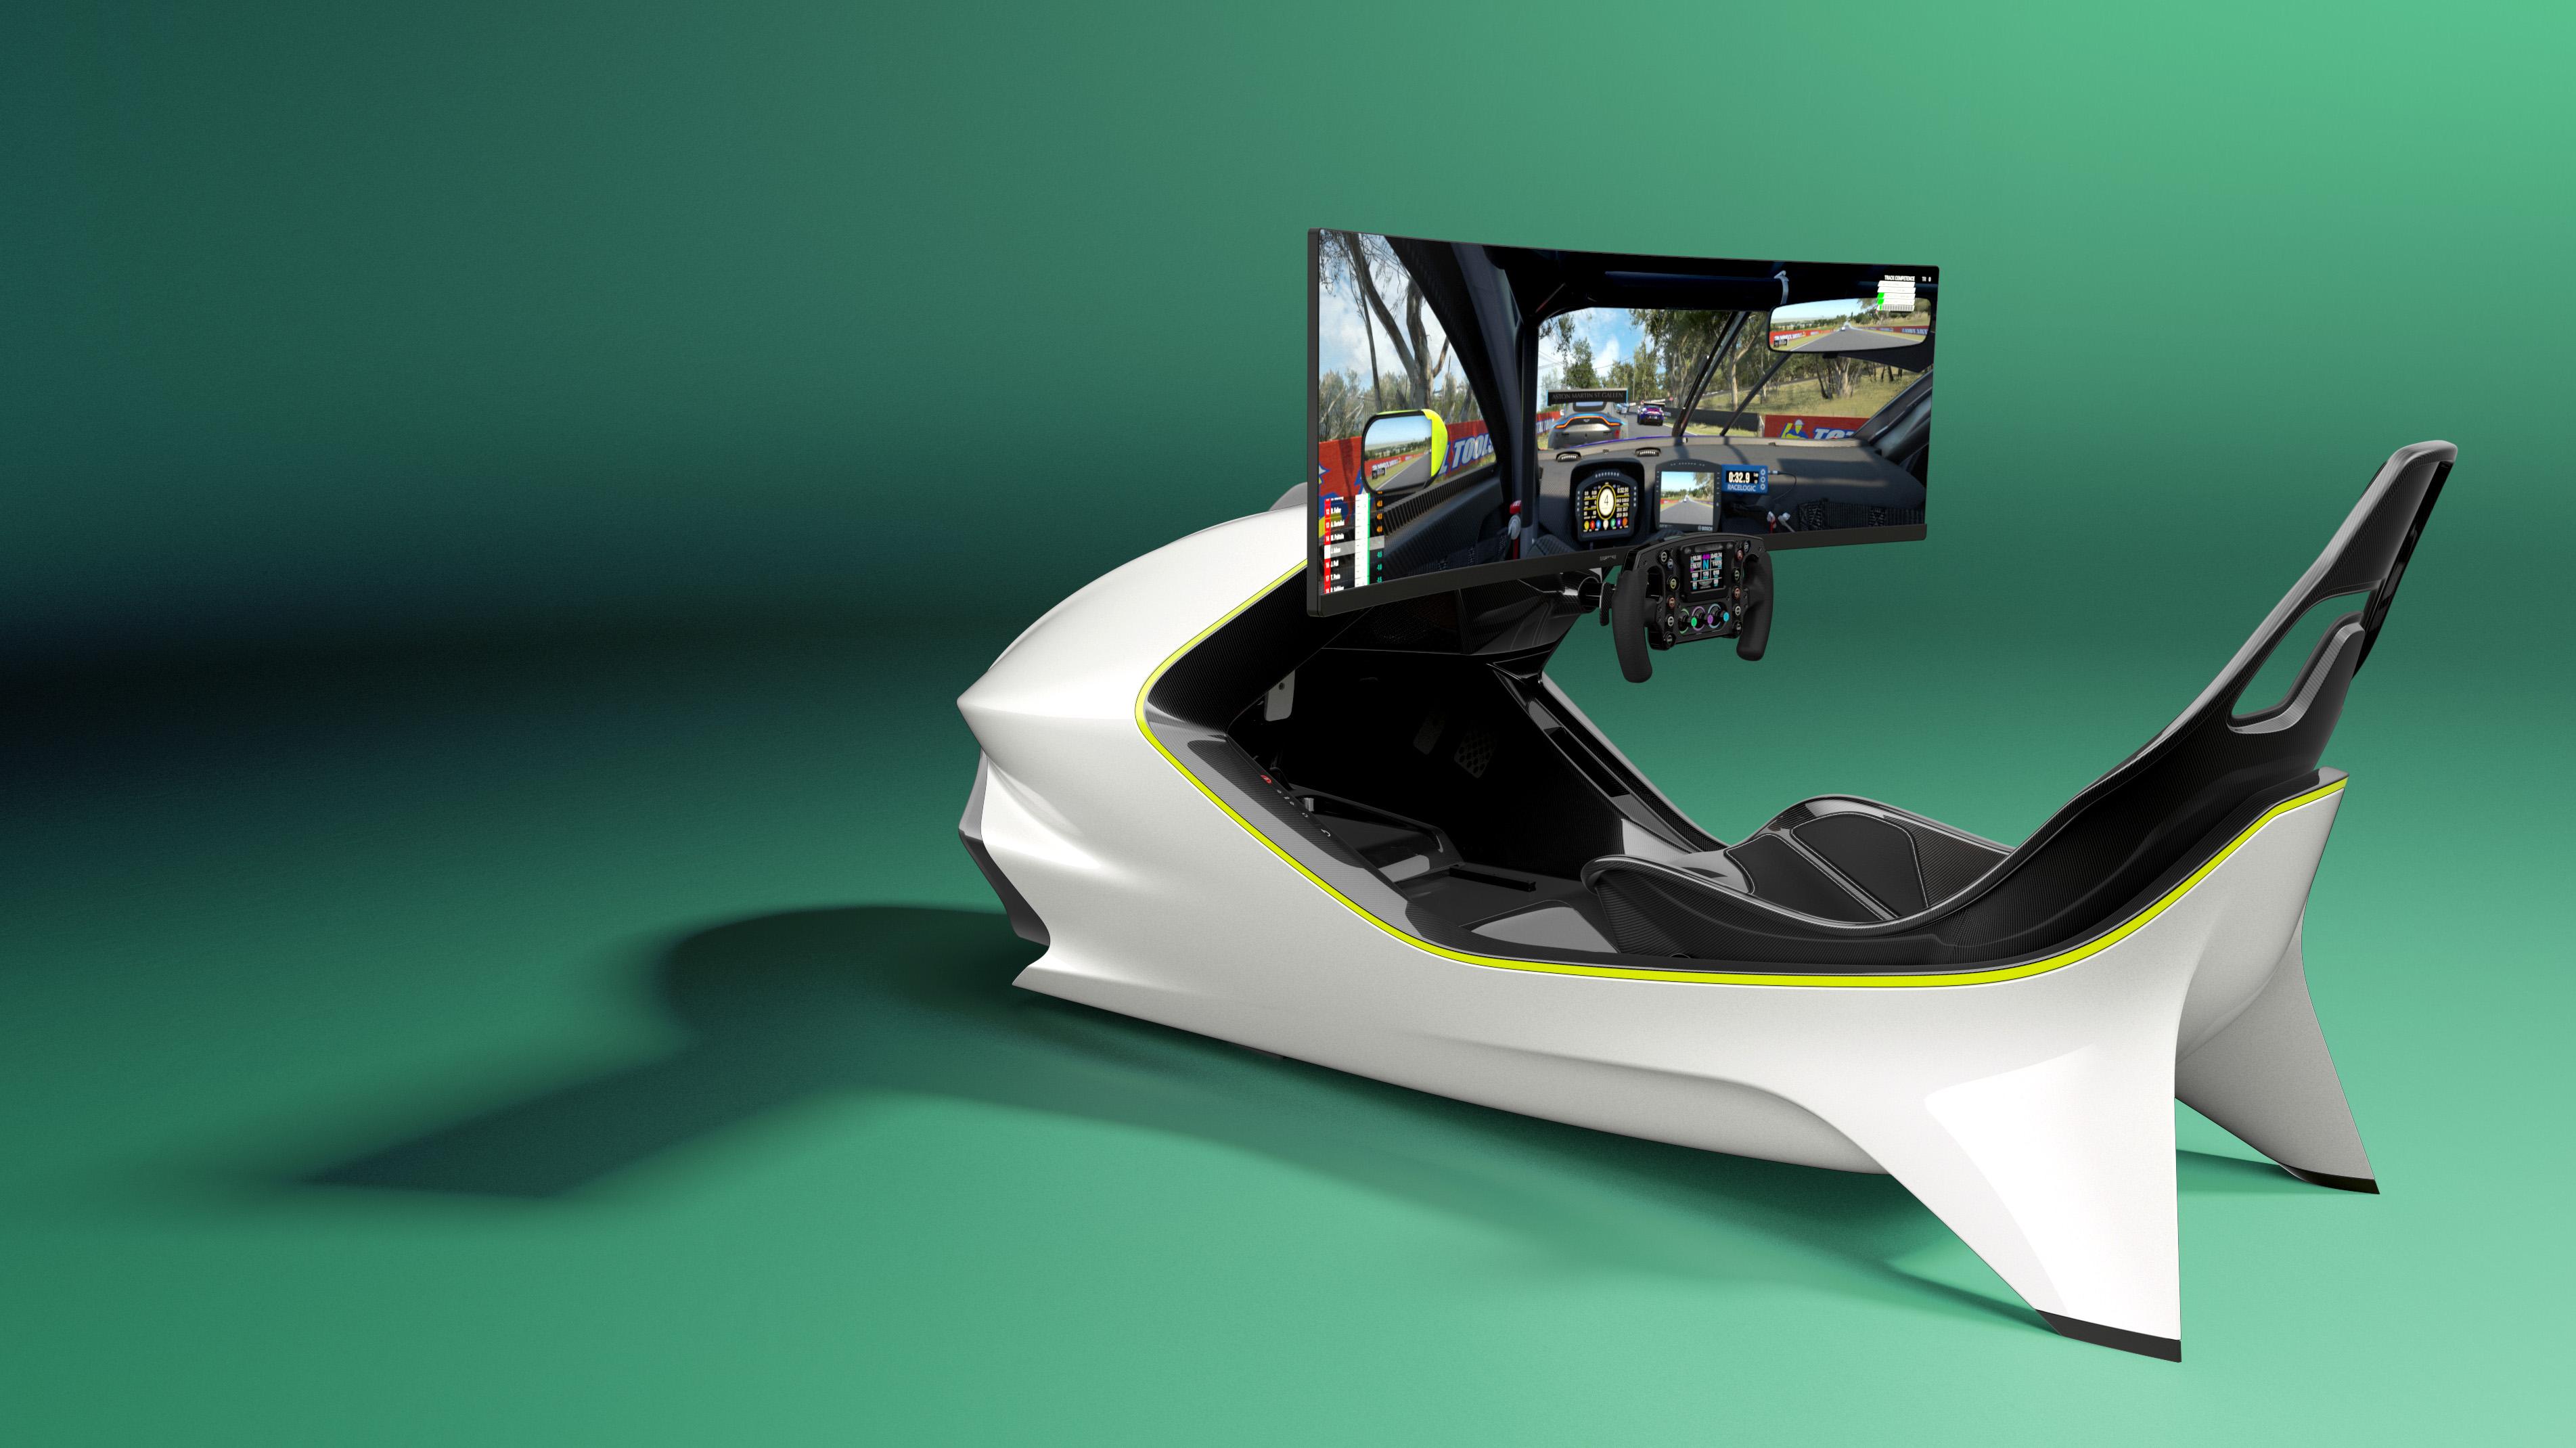 Aston Martin reveals first racing simulator - the AMR-C01